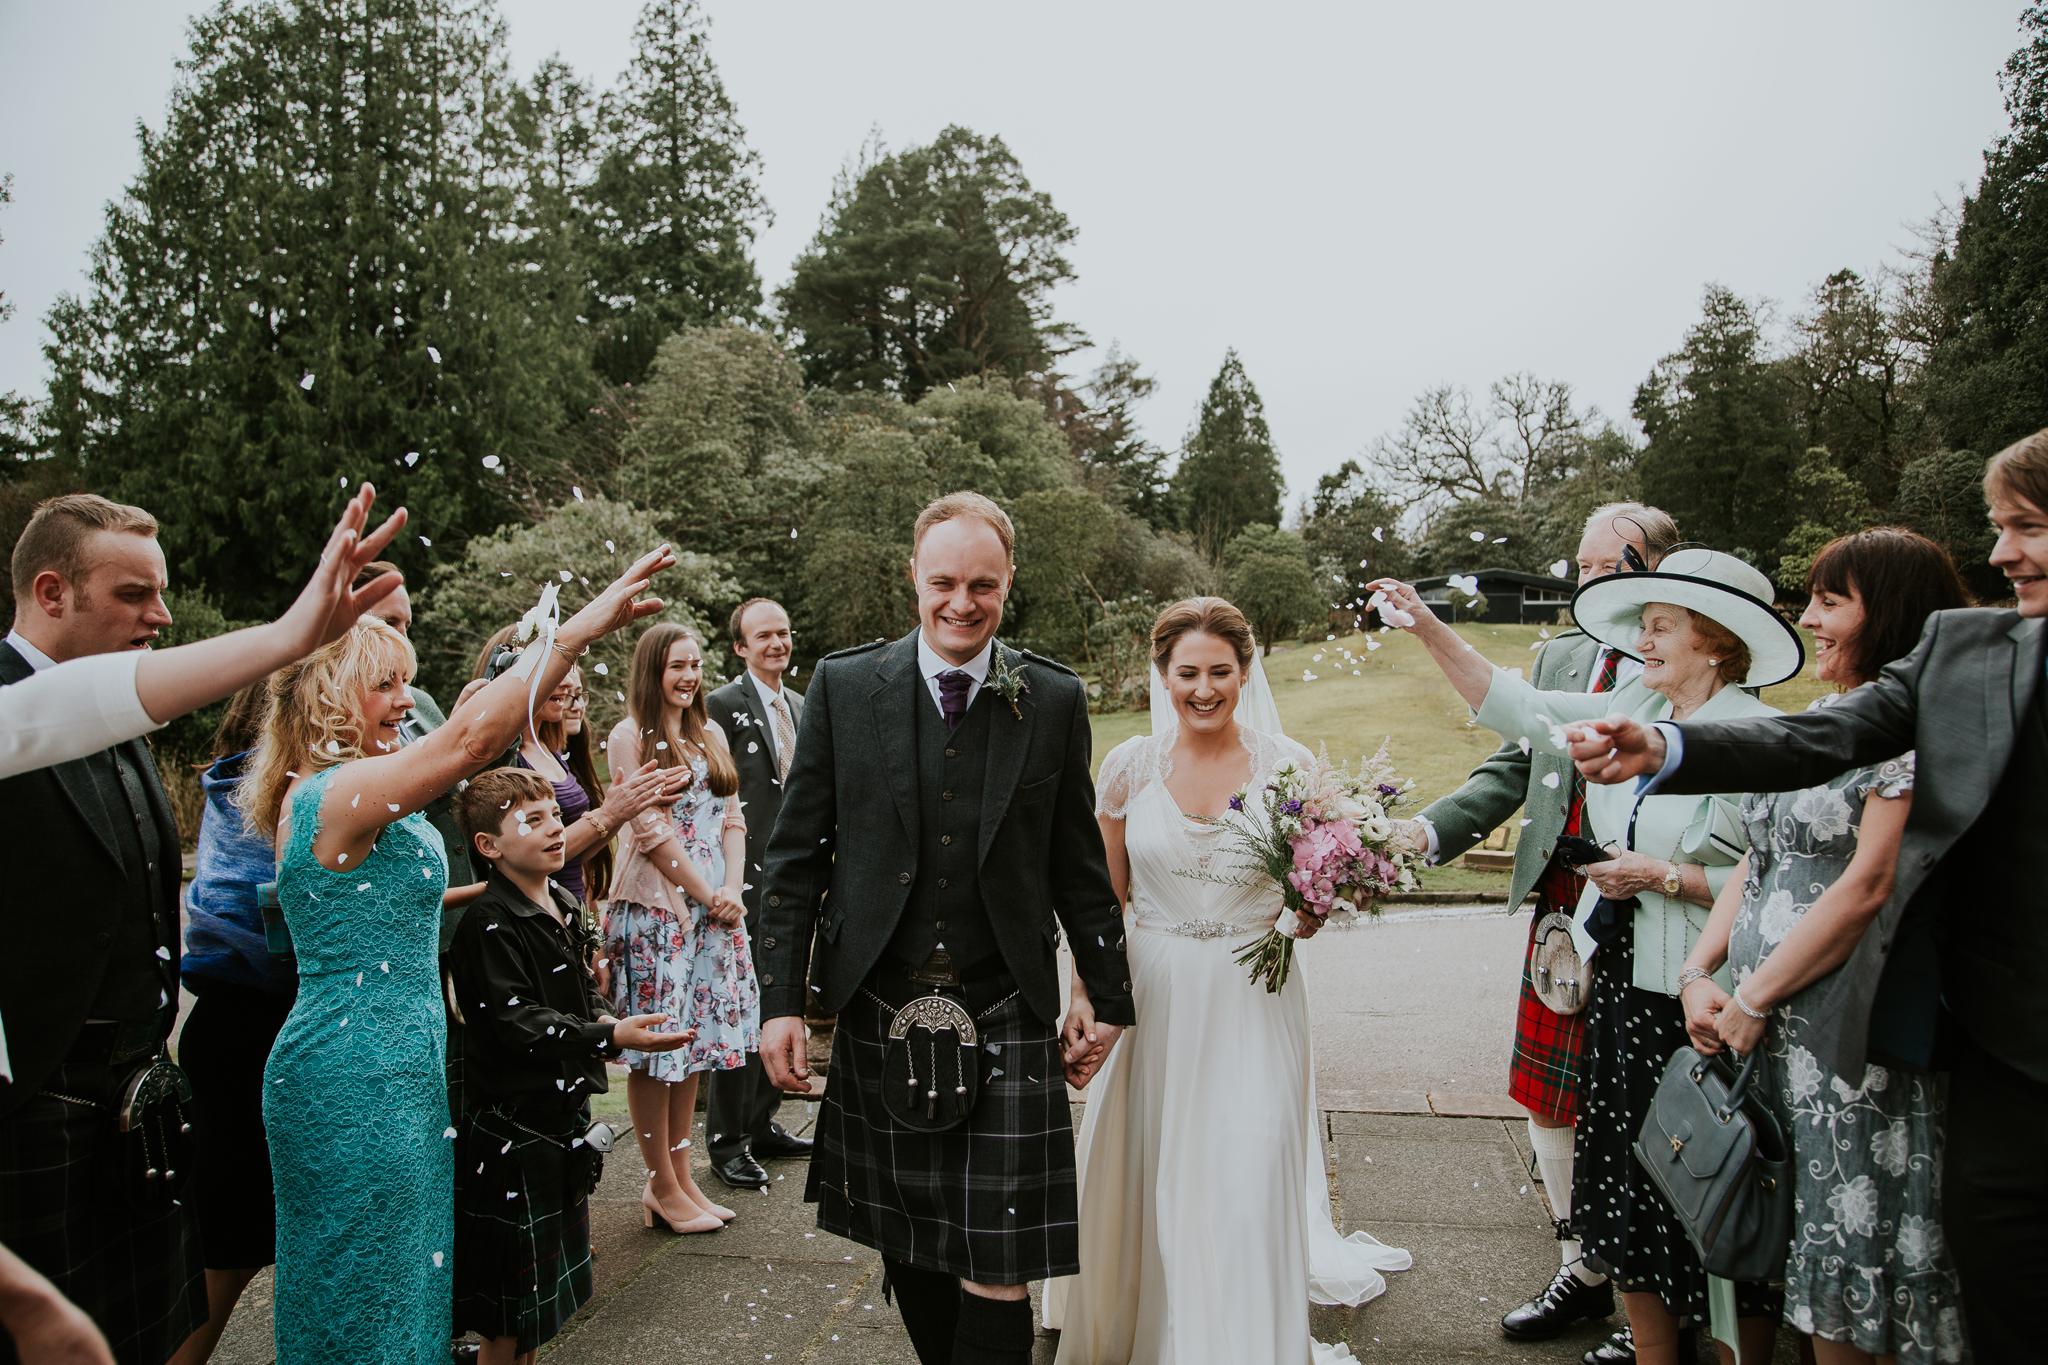 wedding photographer in tarbert, Glasgow wedding photographer